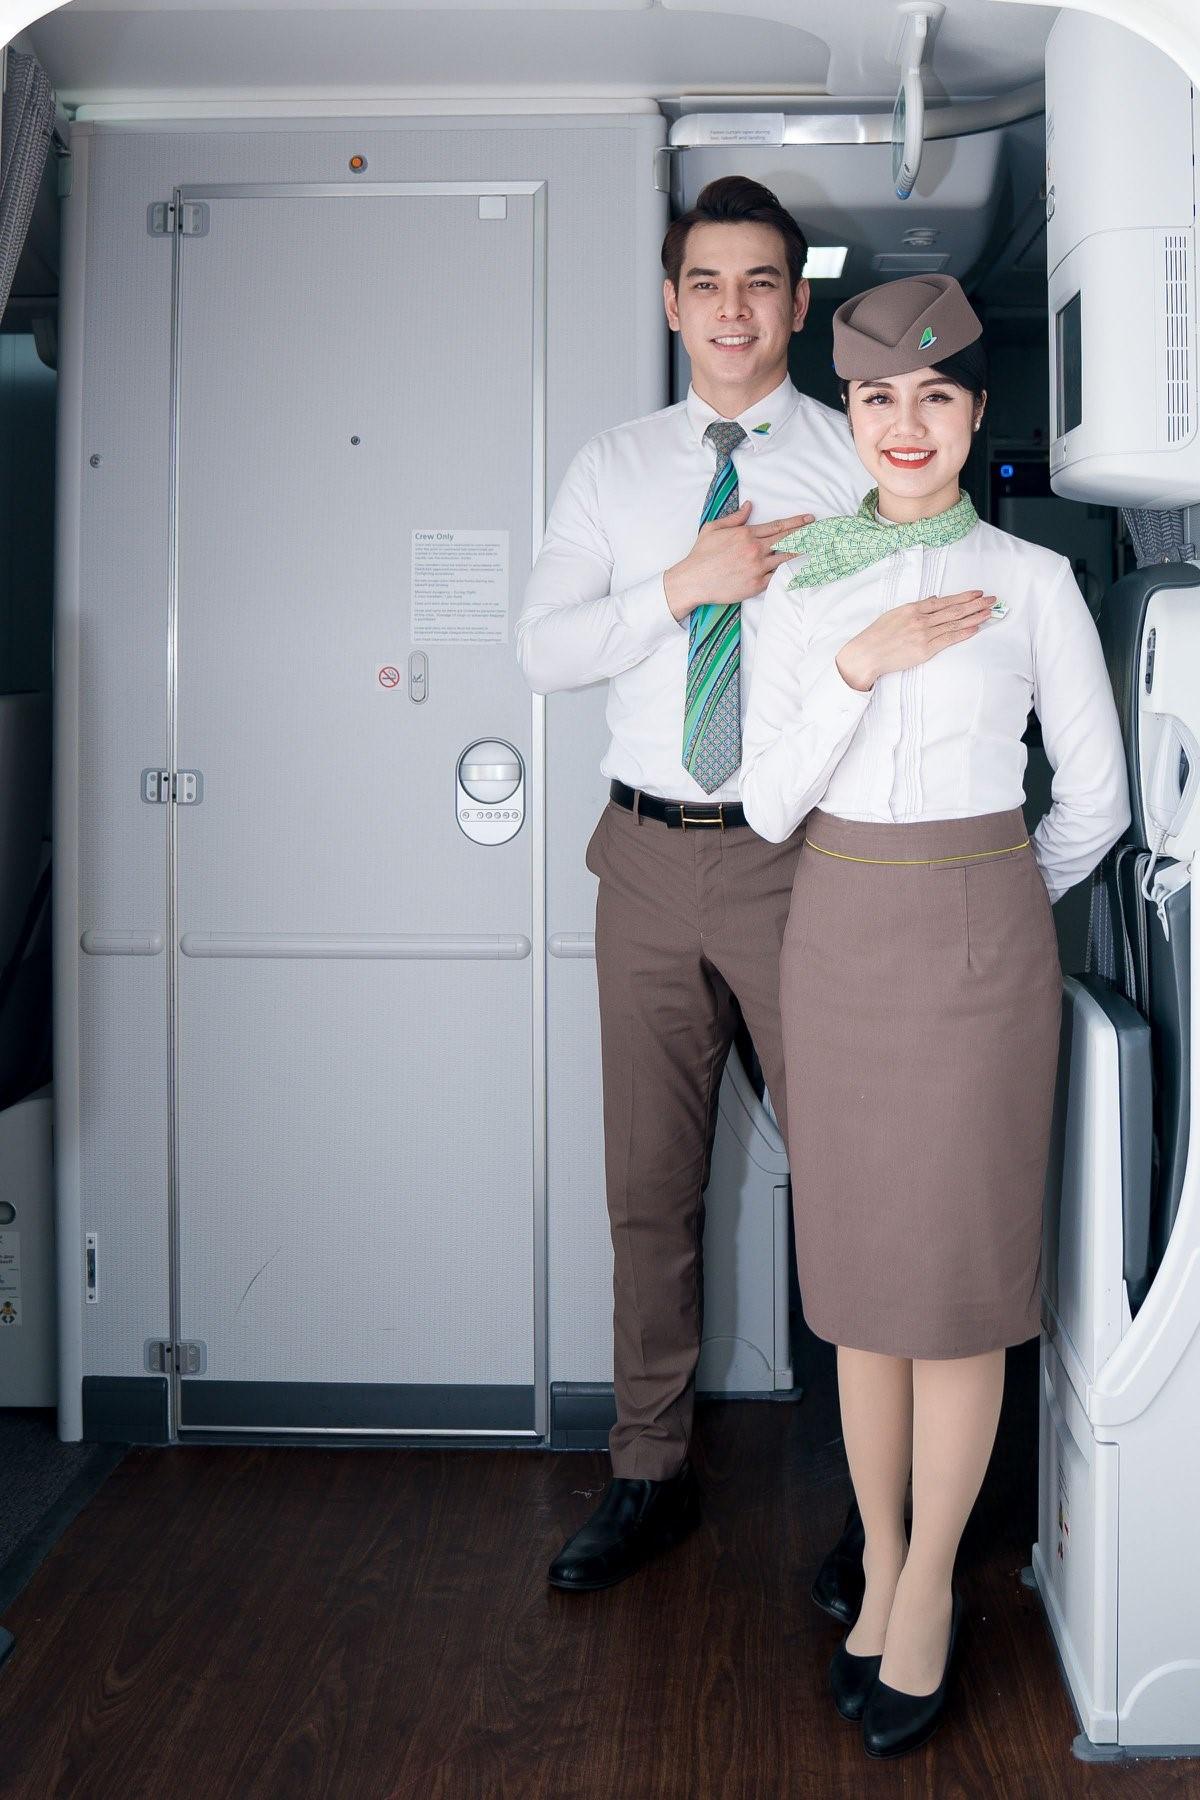 Bamboo Airways cabin crew